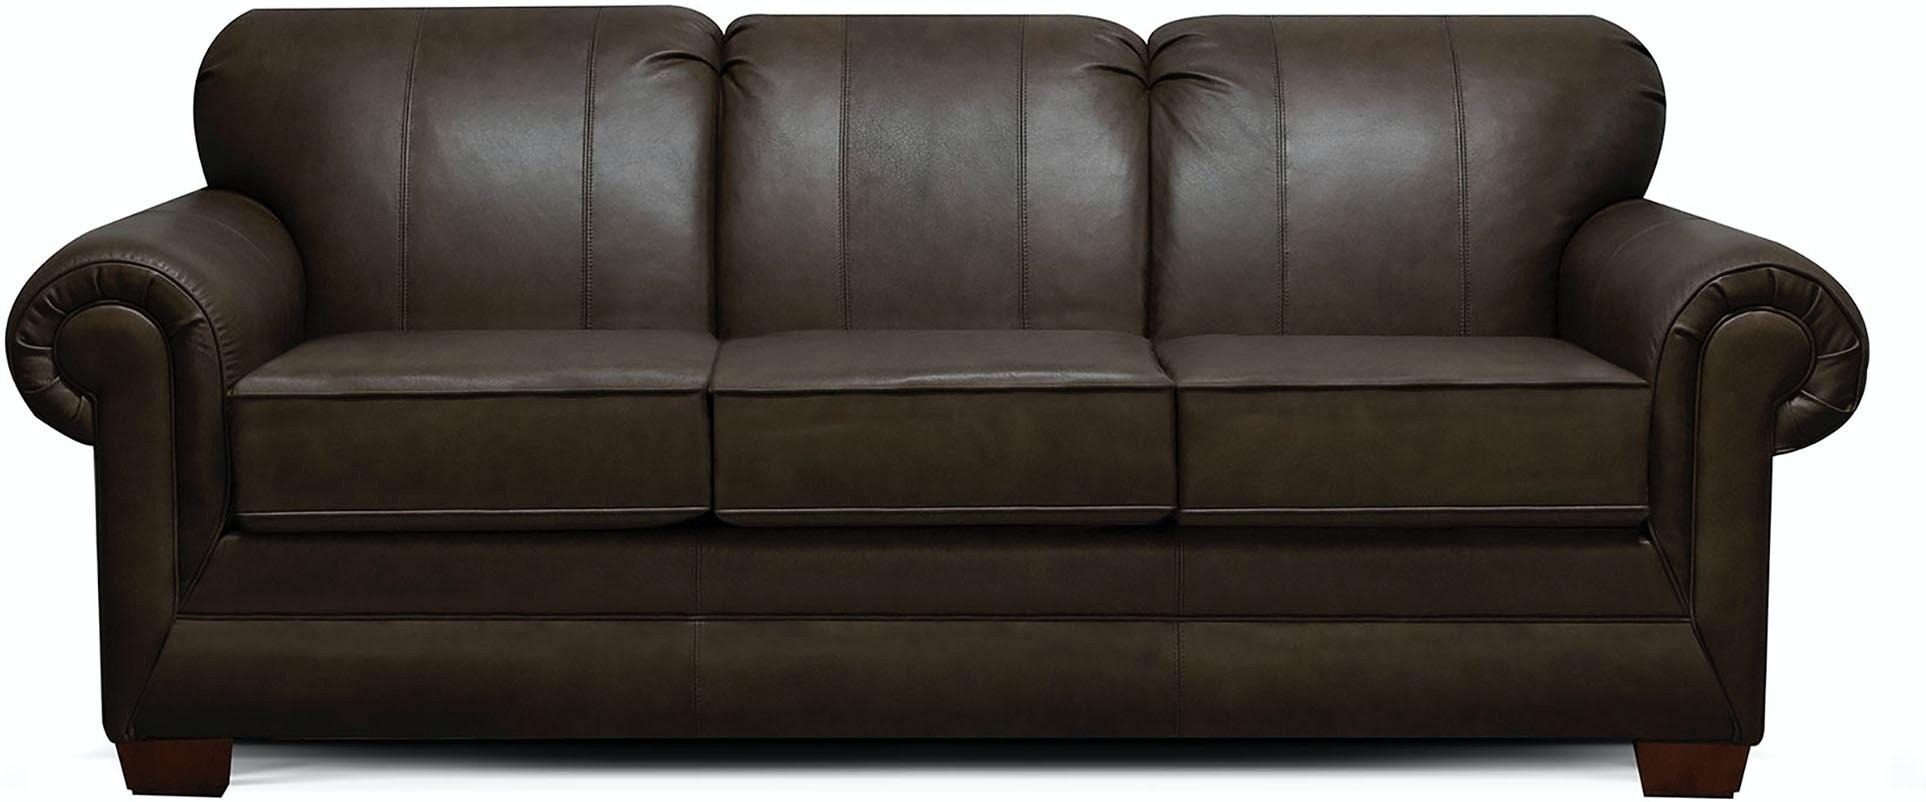 England Living Room Monroe Leather Sofa 1435LSR - Nehligs ...